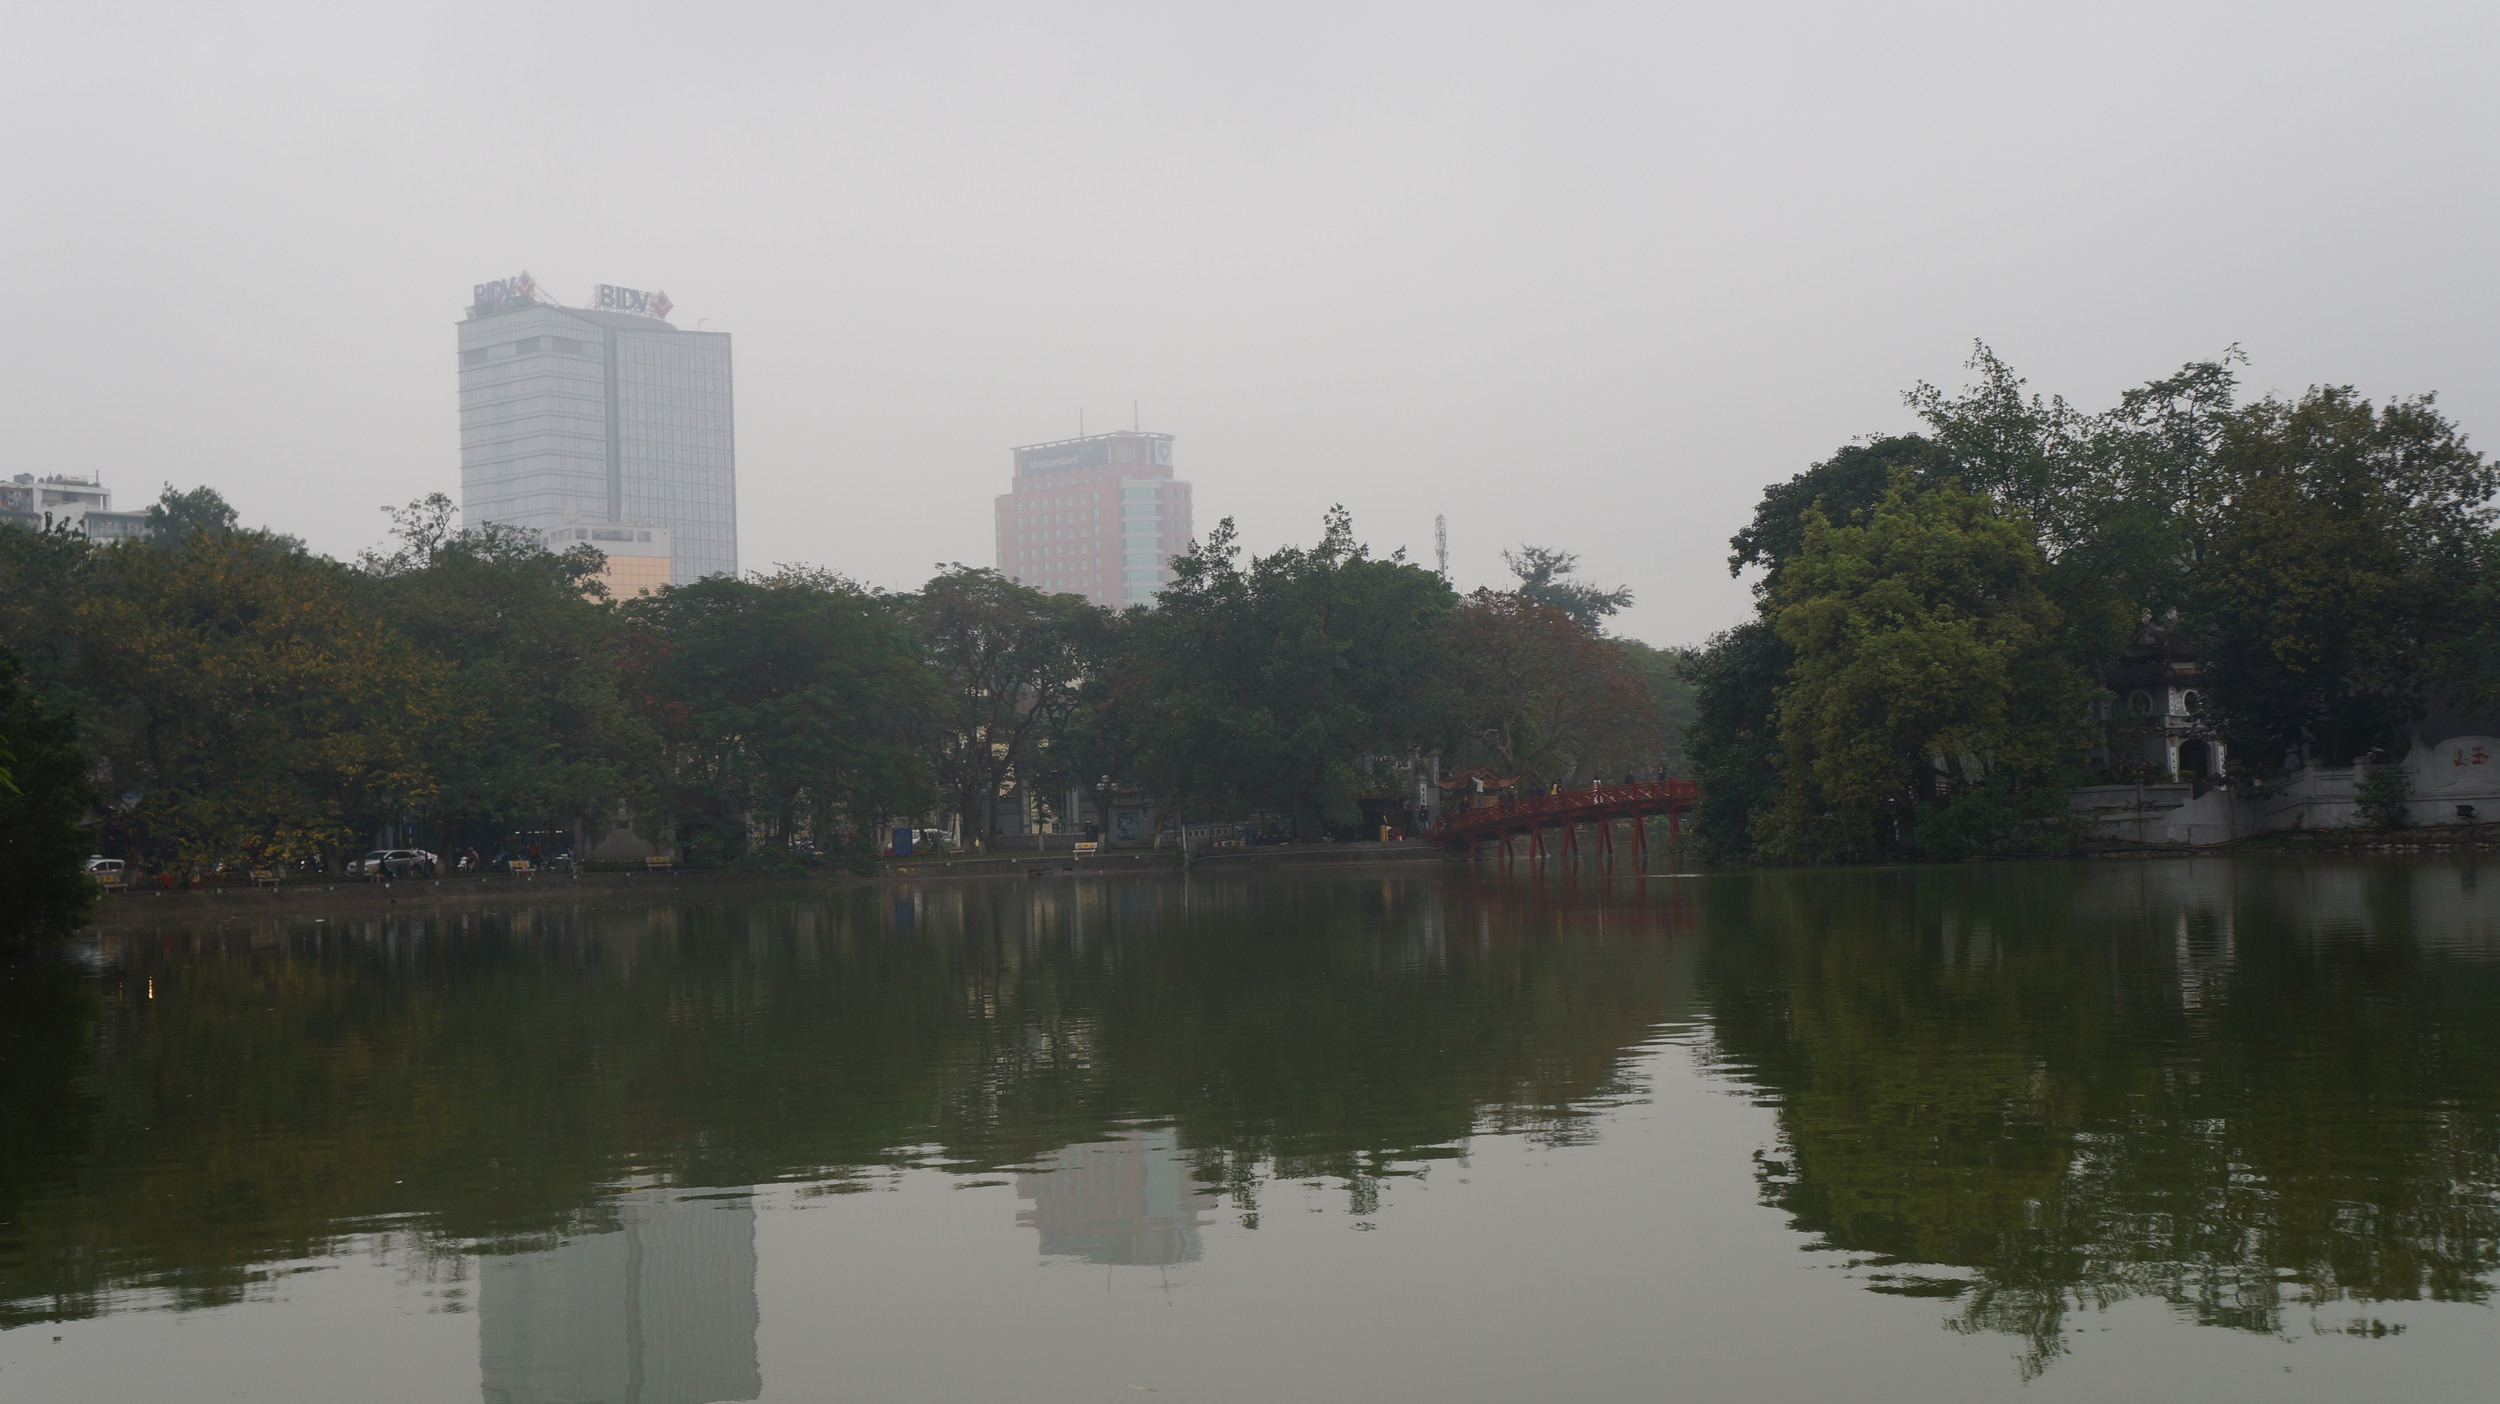 Hanoi's Hoan Kiem Lake with a view of the bridge to Ngoc Son Temple